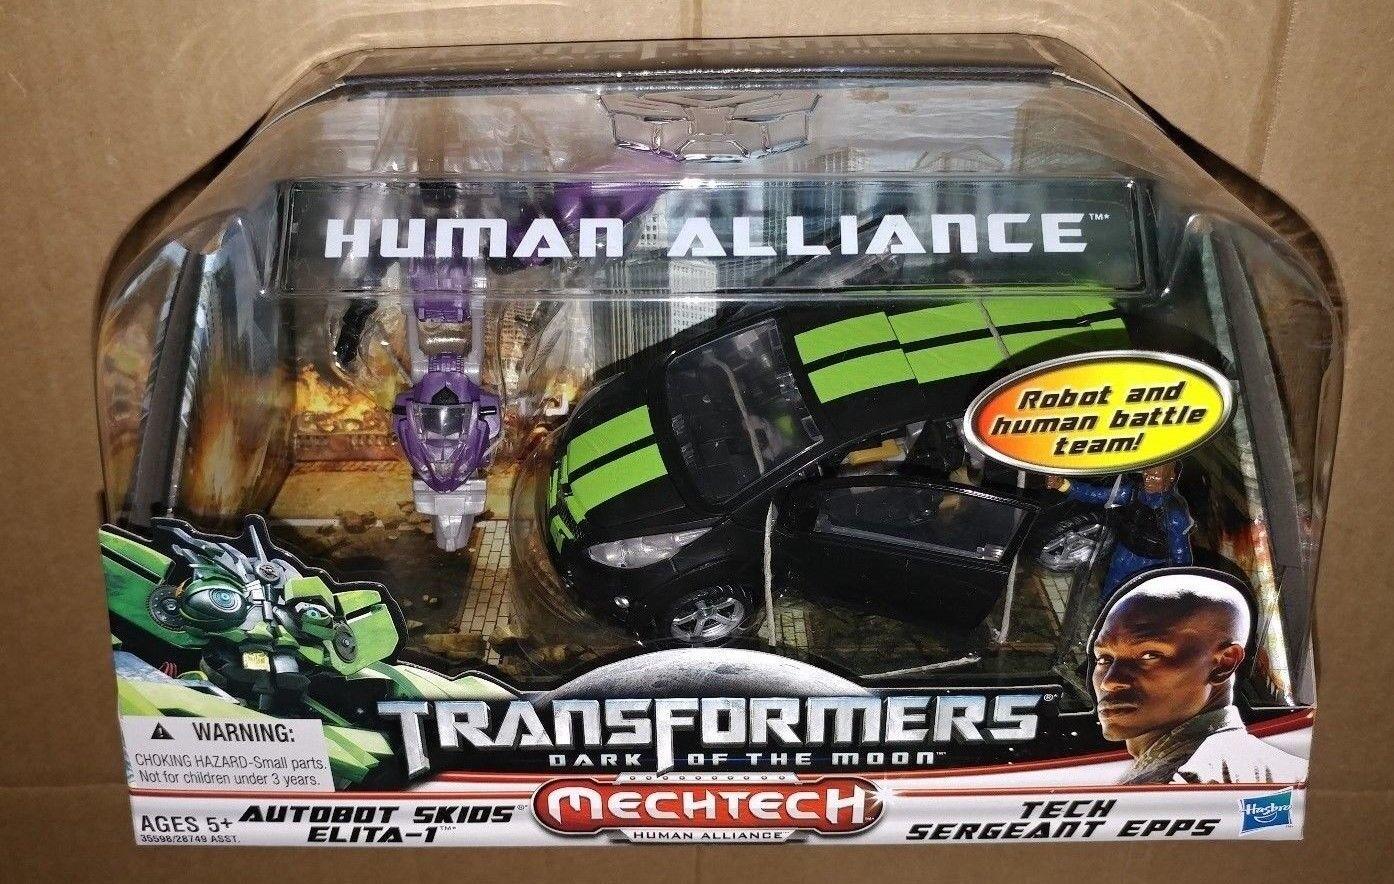 Transformers 3 DOTM HUMAN ALLIANCE AUTOBOT SKIDS & ELITA 1 EPPS Movie USA Chevy